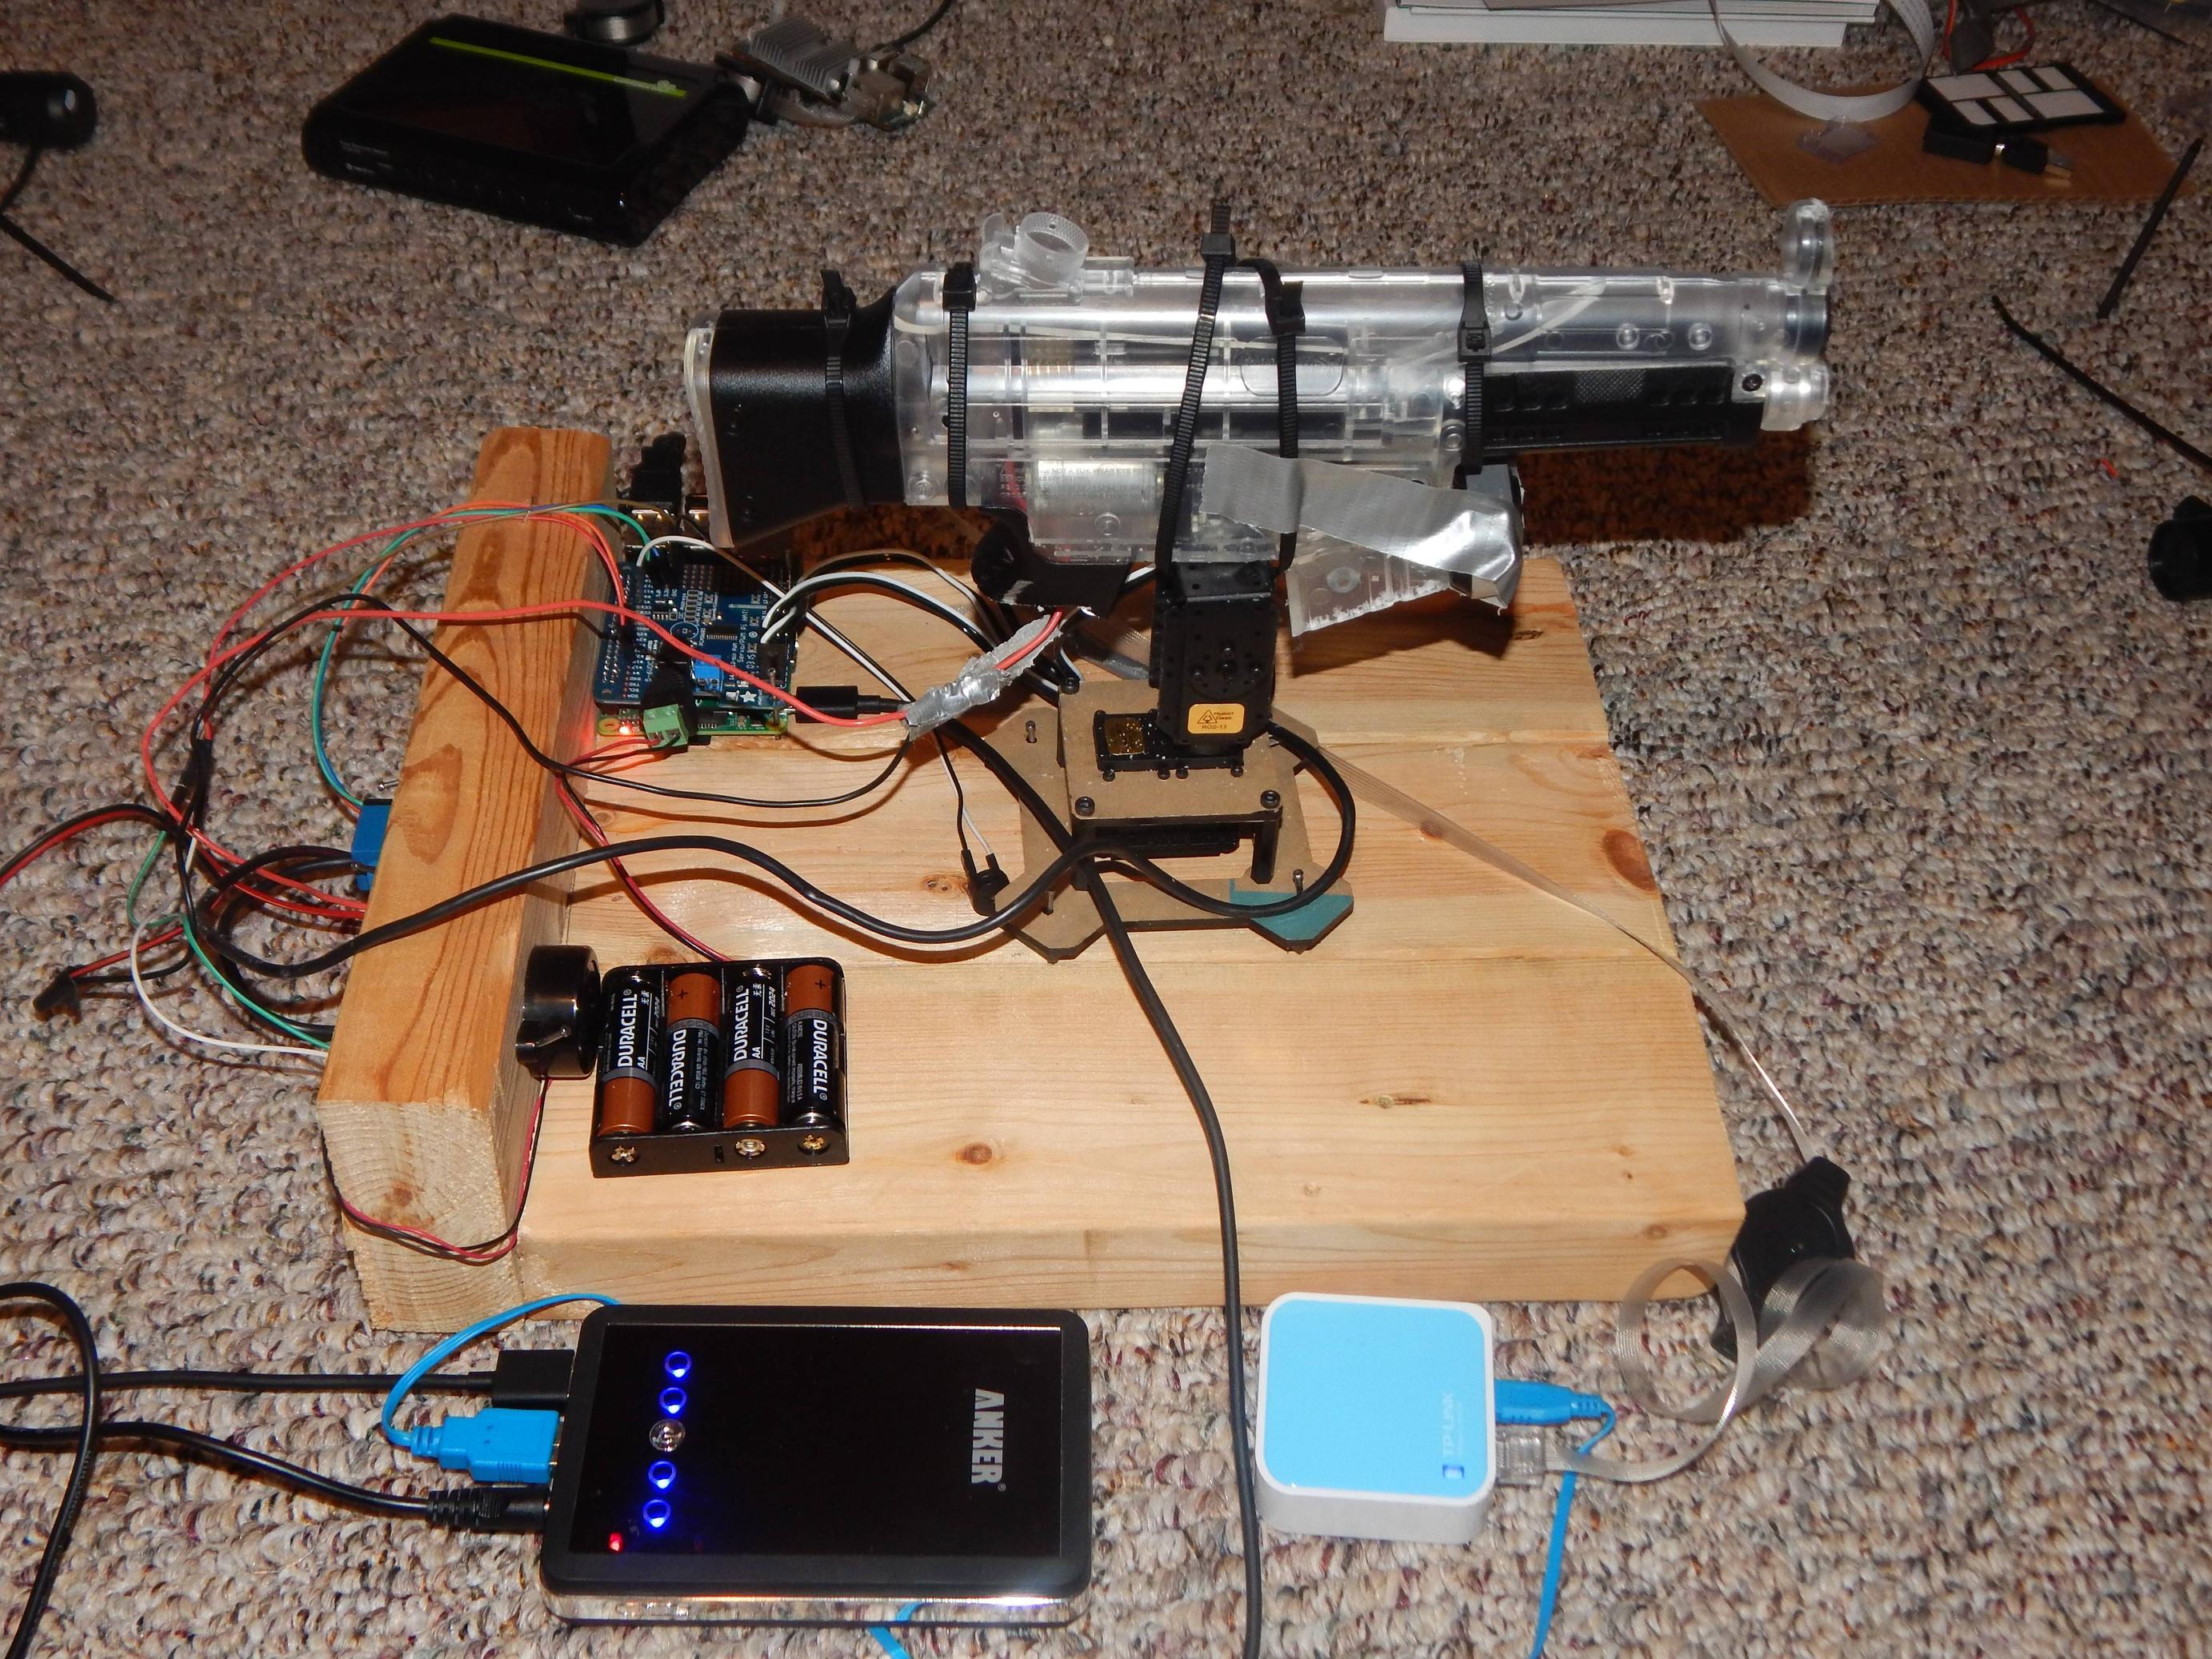 GitHub - matt-desmarais/SentryTurret: A sentry turret style robot